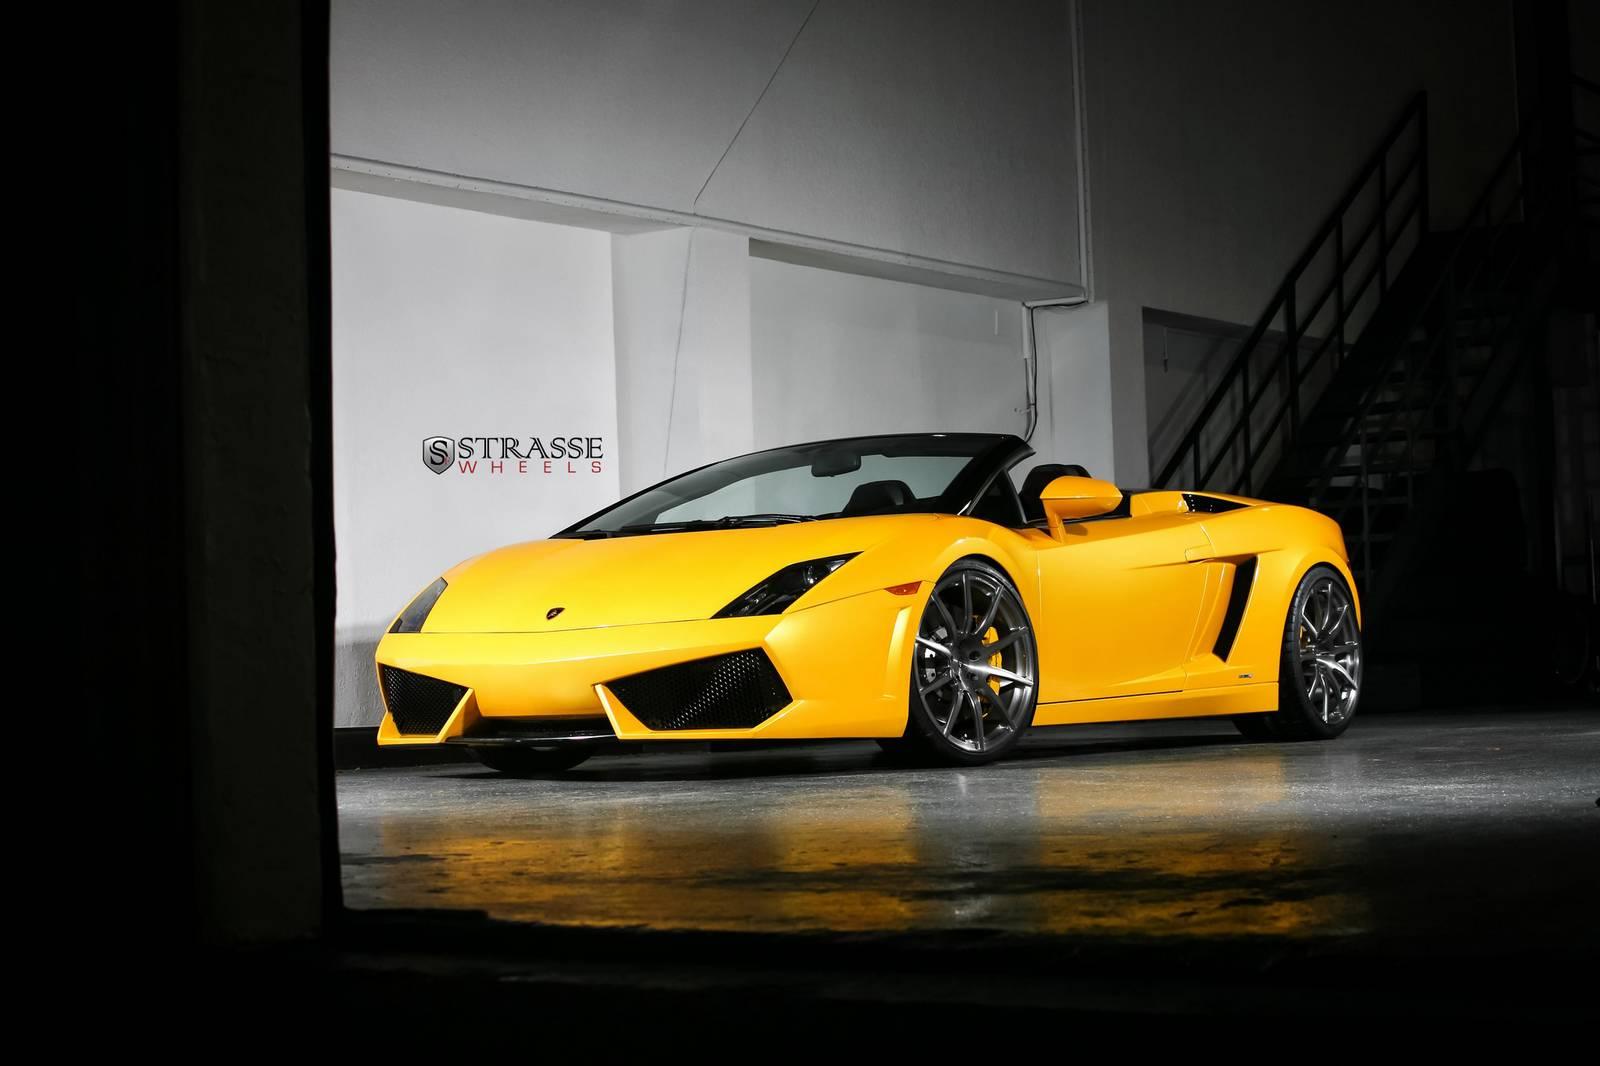 Фото Lamborghini Gallardo Spyder на дисках Strasse Wheels